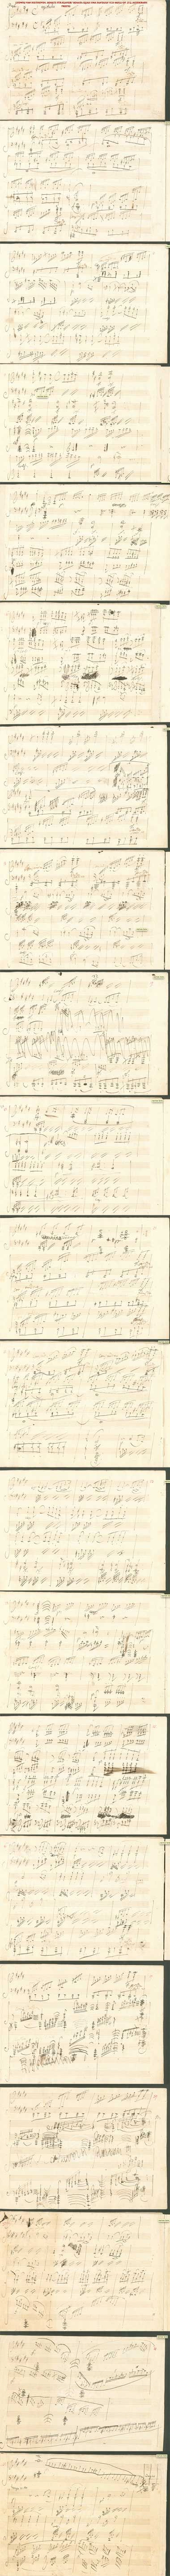 "L v Beethoven, Sonate für Klavier ""Sonata quasi una Fantasia"" (cis-Moll) op. 27,2, PART 3 Presto; Autograph from Beethoven Haus in Bonn, Germany http://www.beethoven-haus-bonn.de/sixcms/detail.php?id=15123template=dokseite_digitales_archiv_de_dokid=wm20set%5Bdouble%5D=0set%5Bmets%5D=http%3A%2F%2Fwww.beethoven-haus-bonn.de%2Fmods%2F00003292.mods.xml"